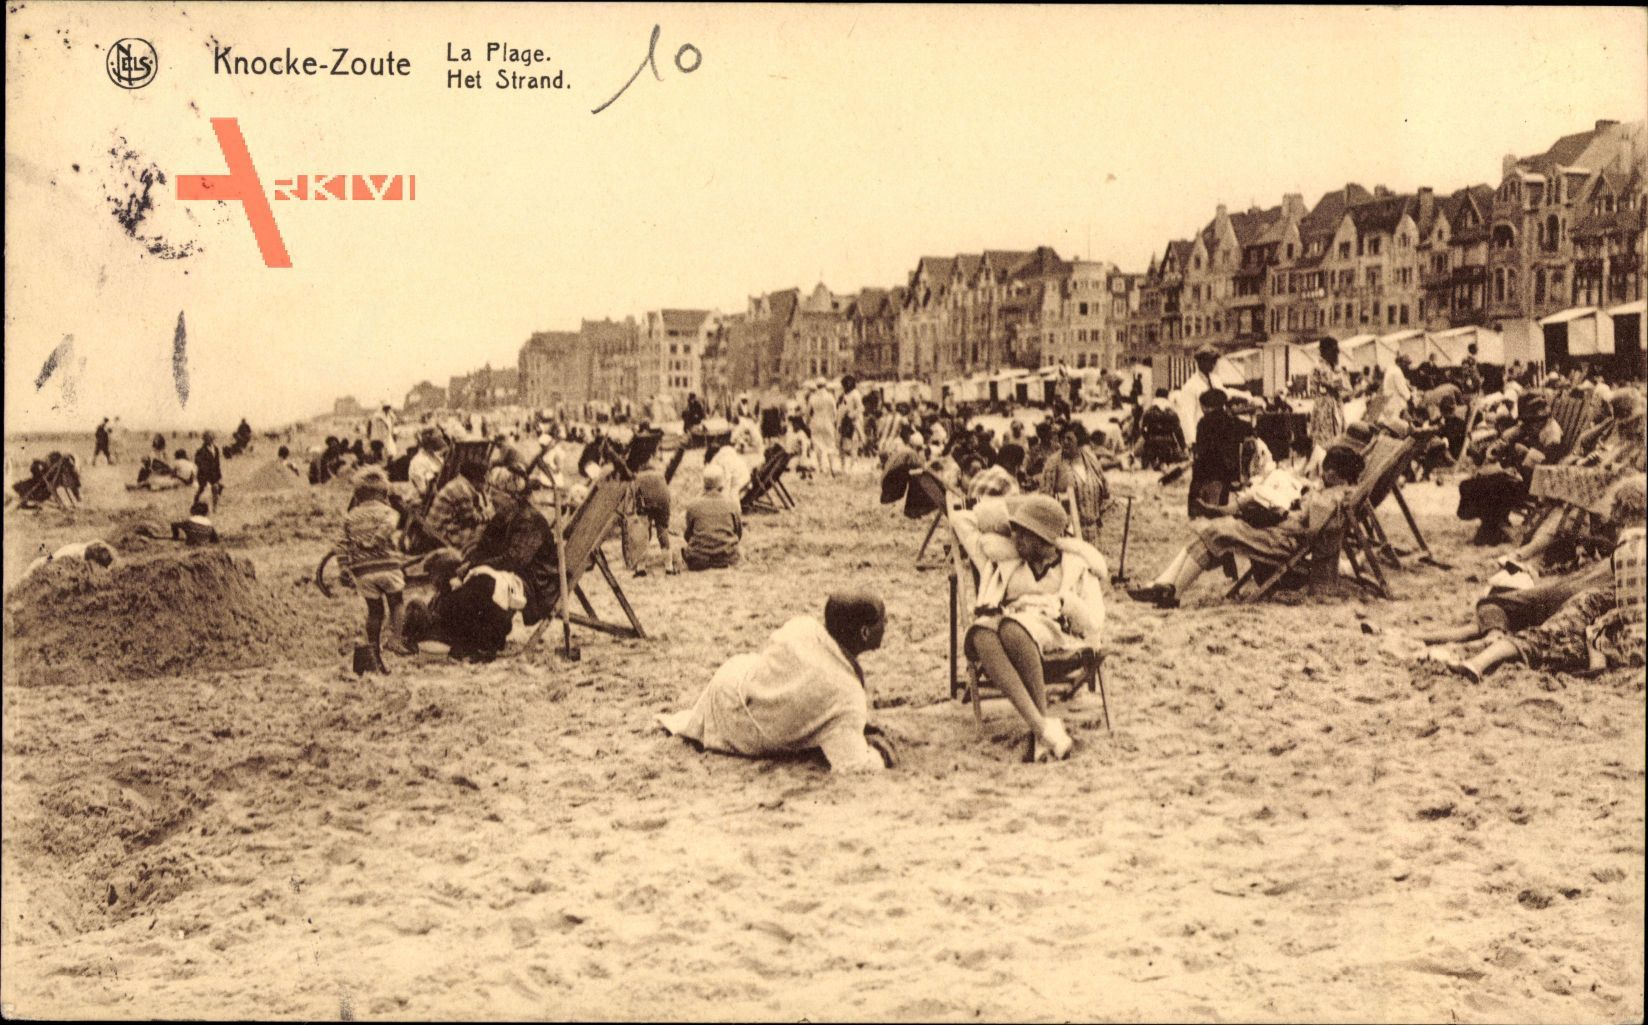 Knocke Zoute Westflandern Belgien, La Plage, Strandpartie, Sand